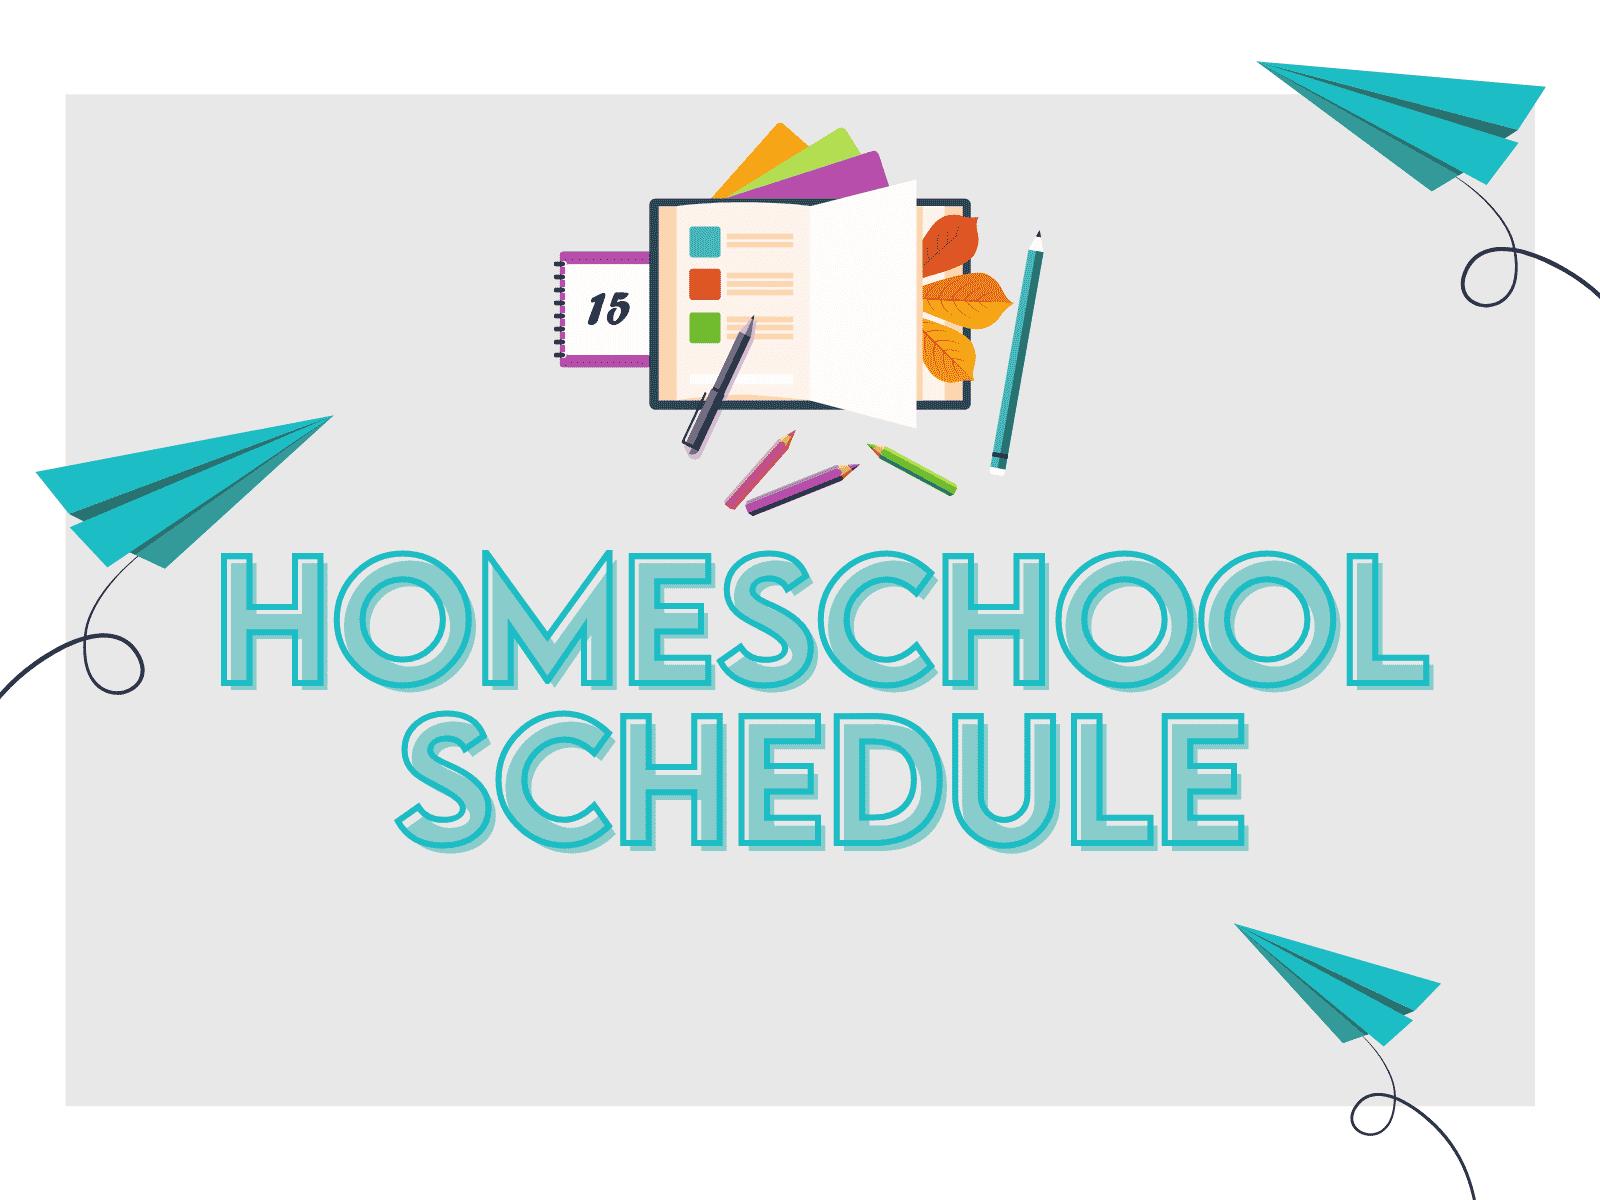 Free homeschool schedule for educators, teachers, and parents.